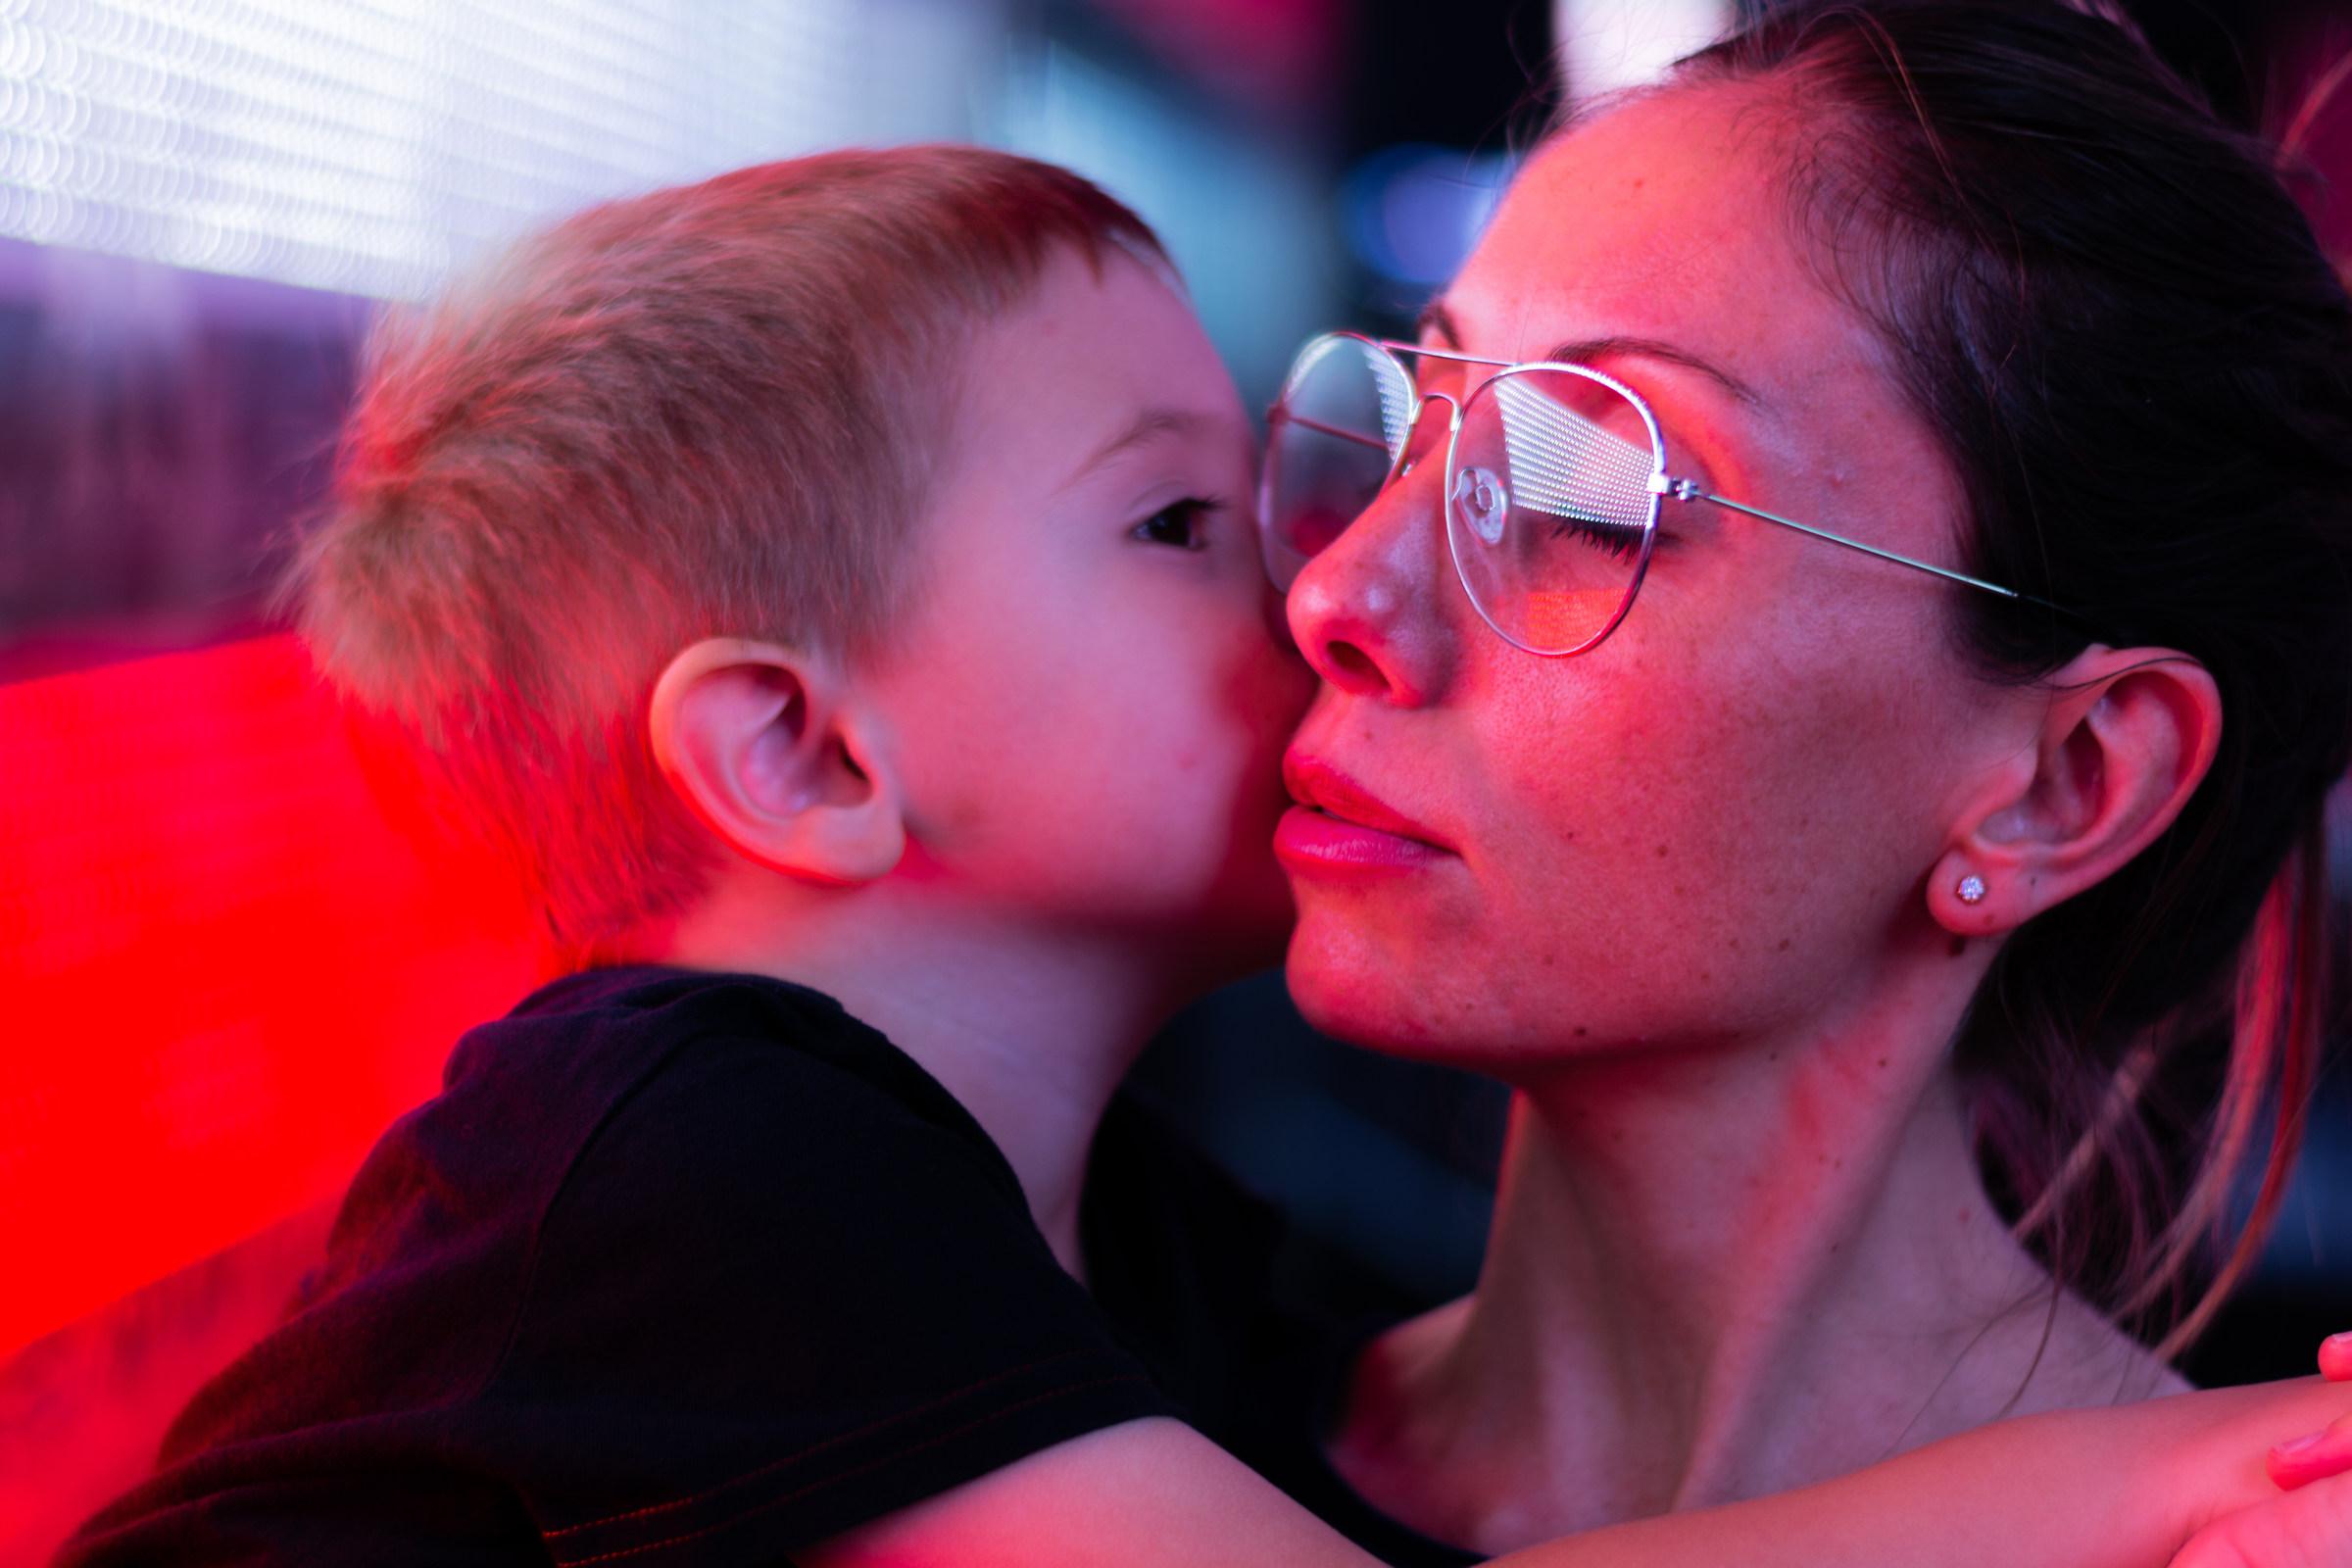 Maternal love...